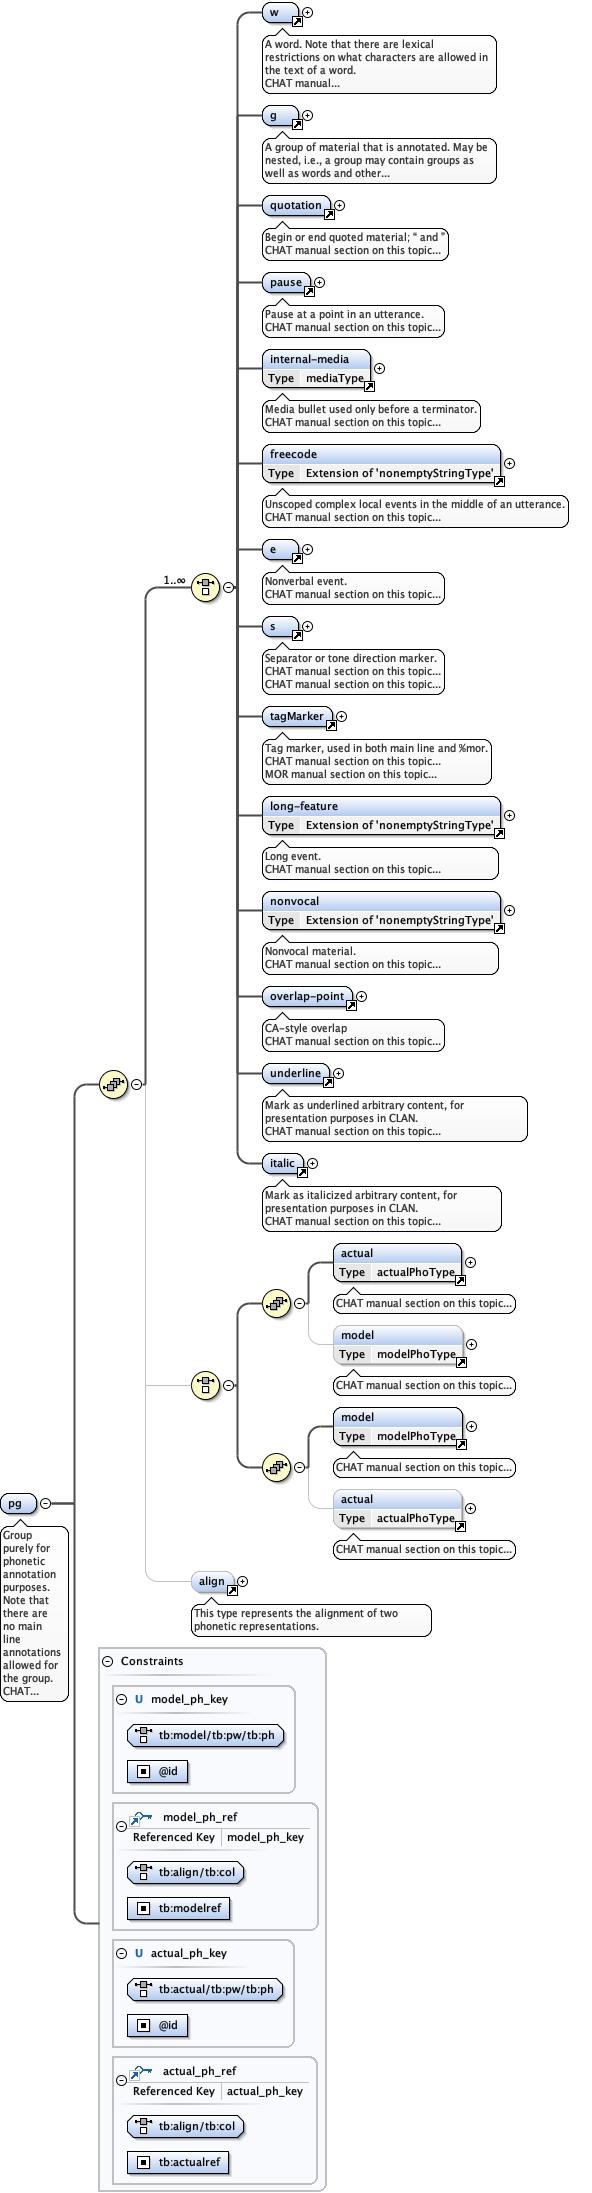 Schema documentation for talkbank.xsd